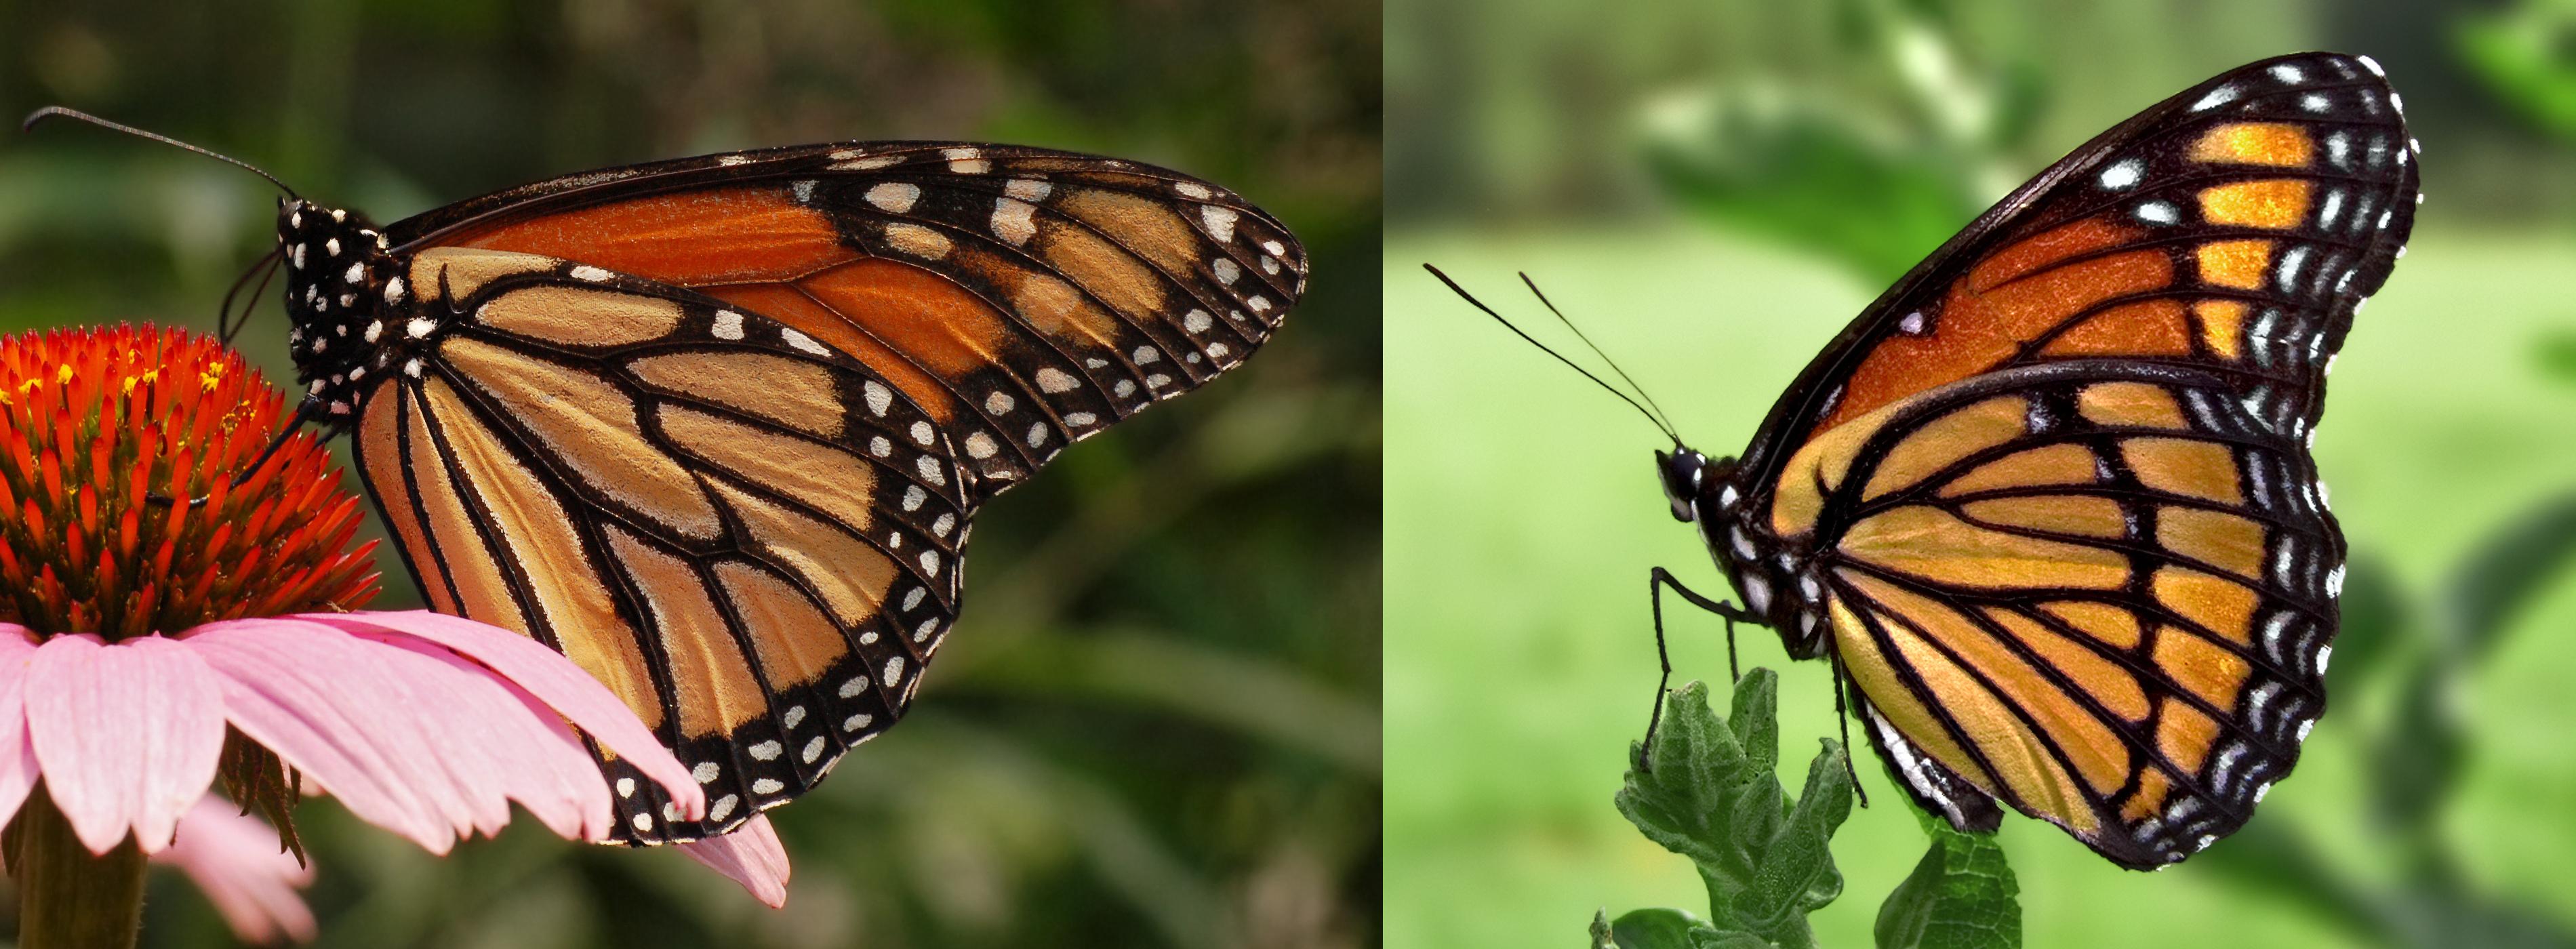 Monarch butterfly body - photo#28